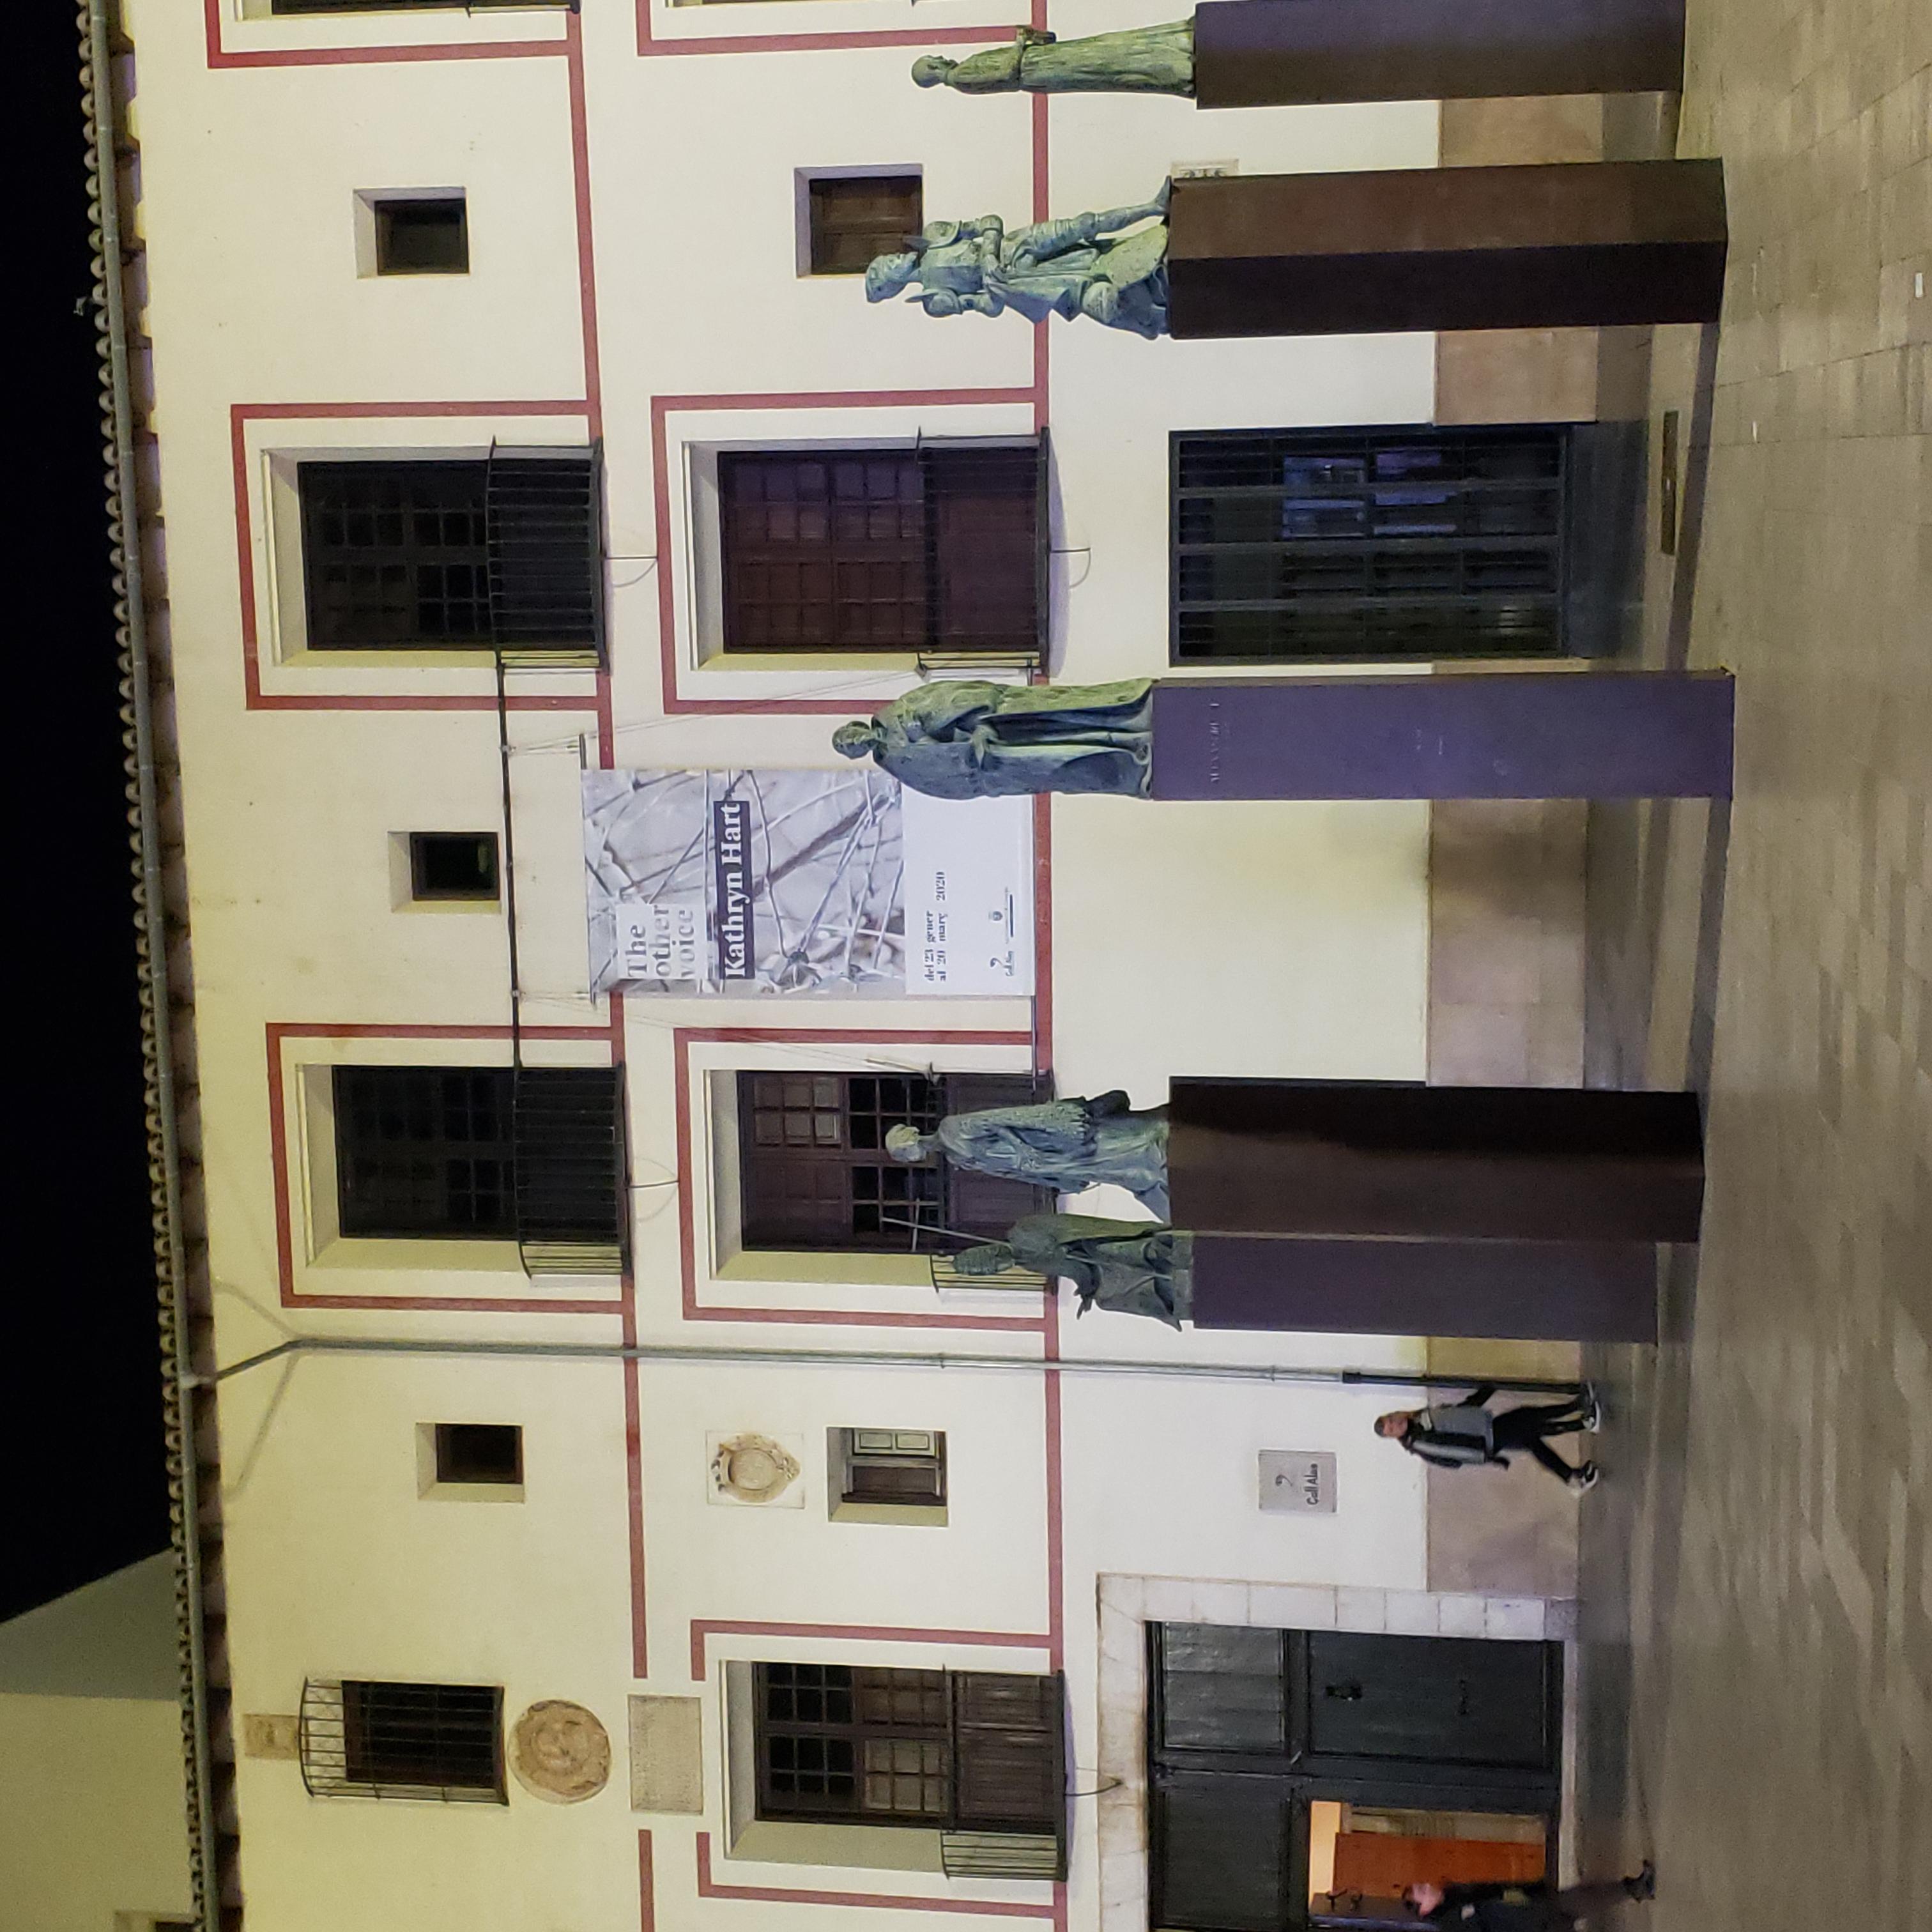 Kathryn Hart, THE OTHER VOICE, Sala Coll Alas de Gandia, Spain 2020